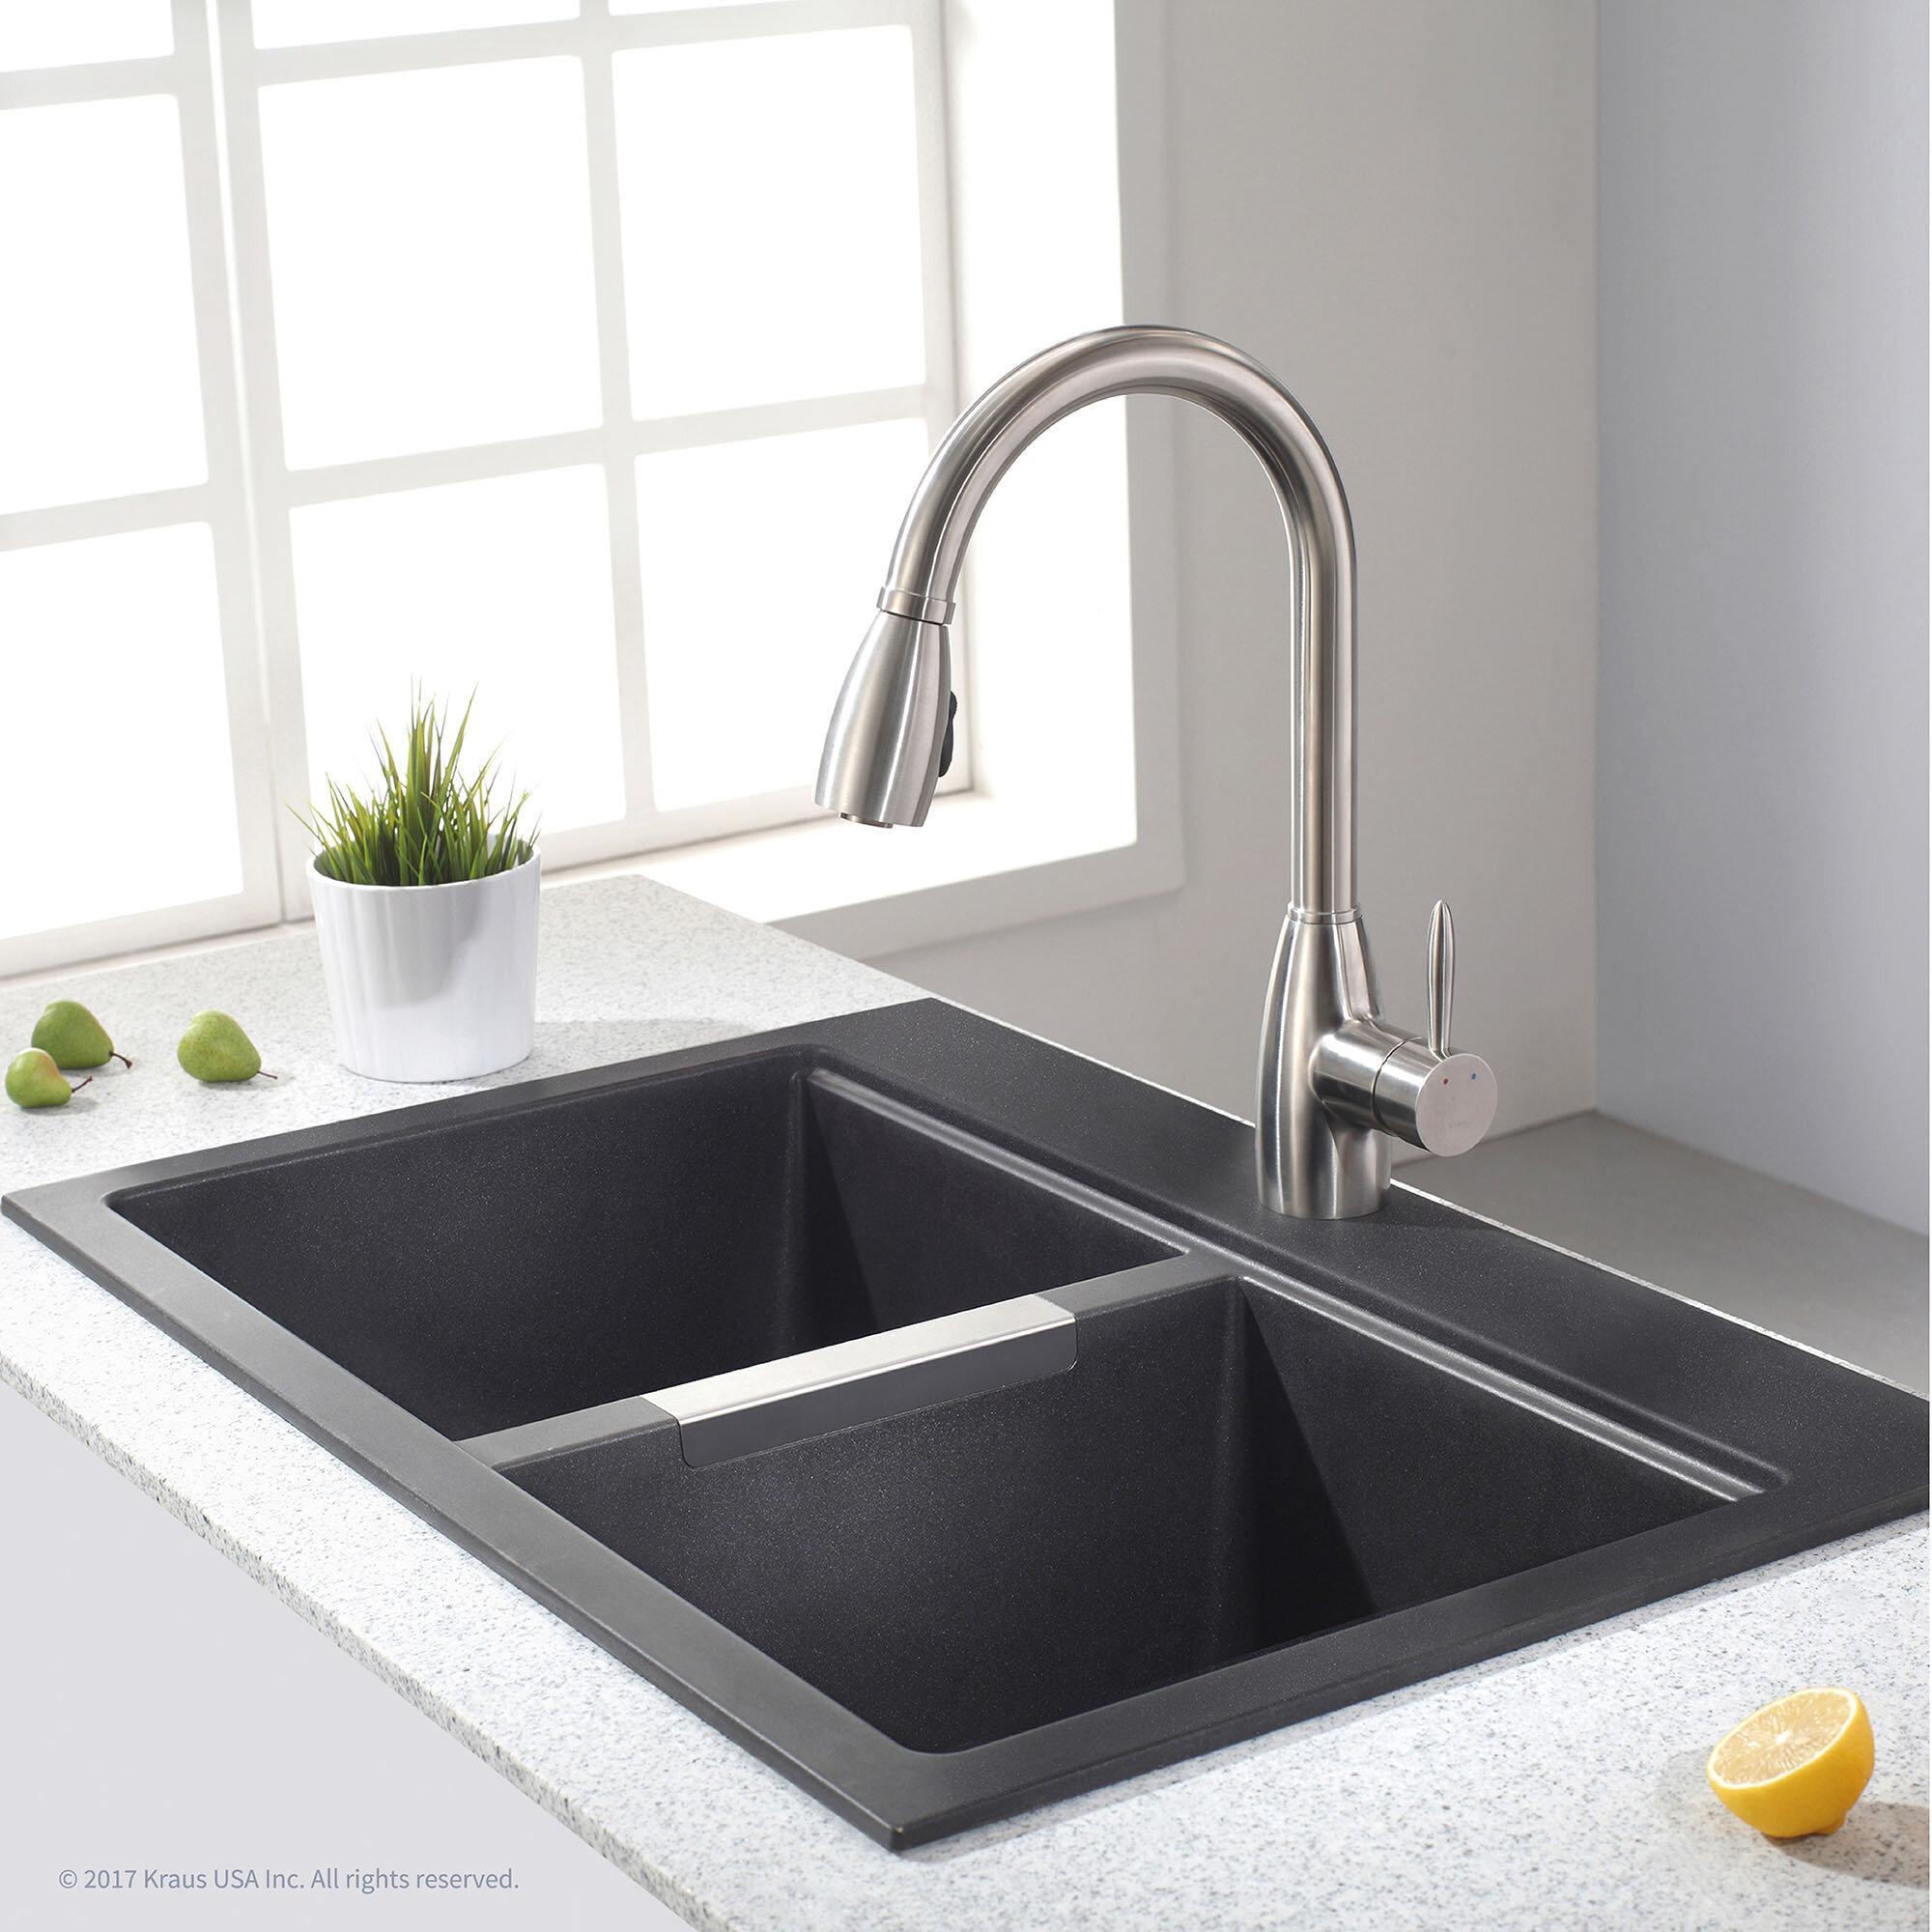 Kgd 433b Granite 33 L X 22 W Double Basin Dual Mount Kitchen Sink